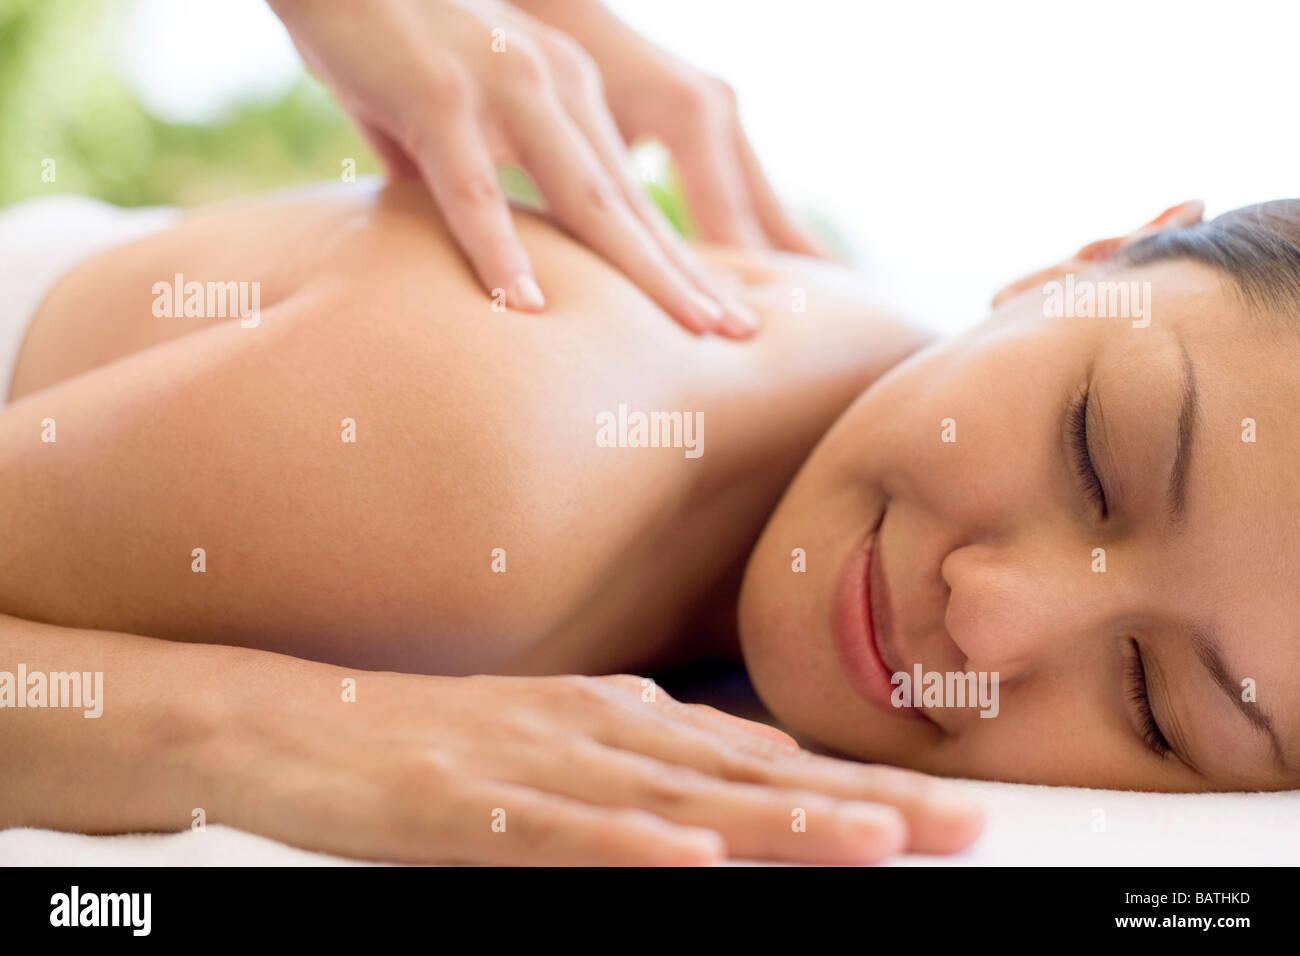 Massage. Woman receiving a shoulder massage. Stock Photo